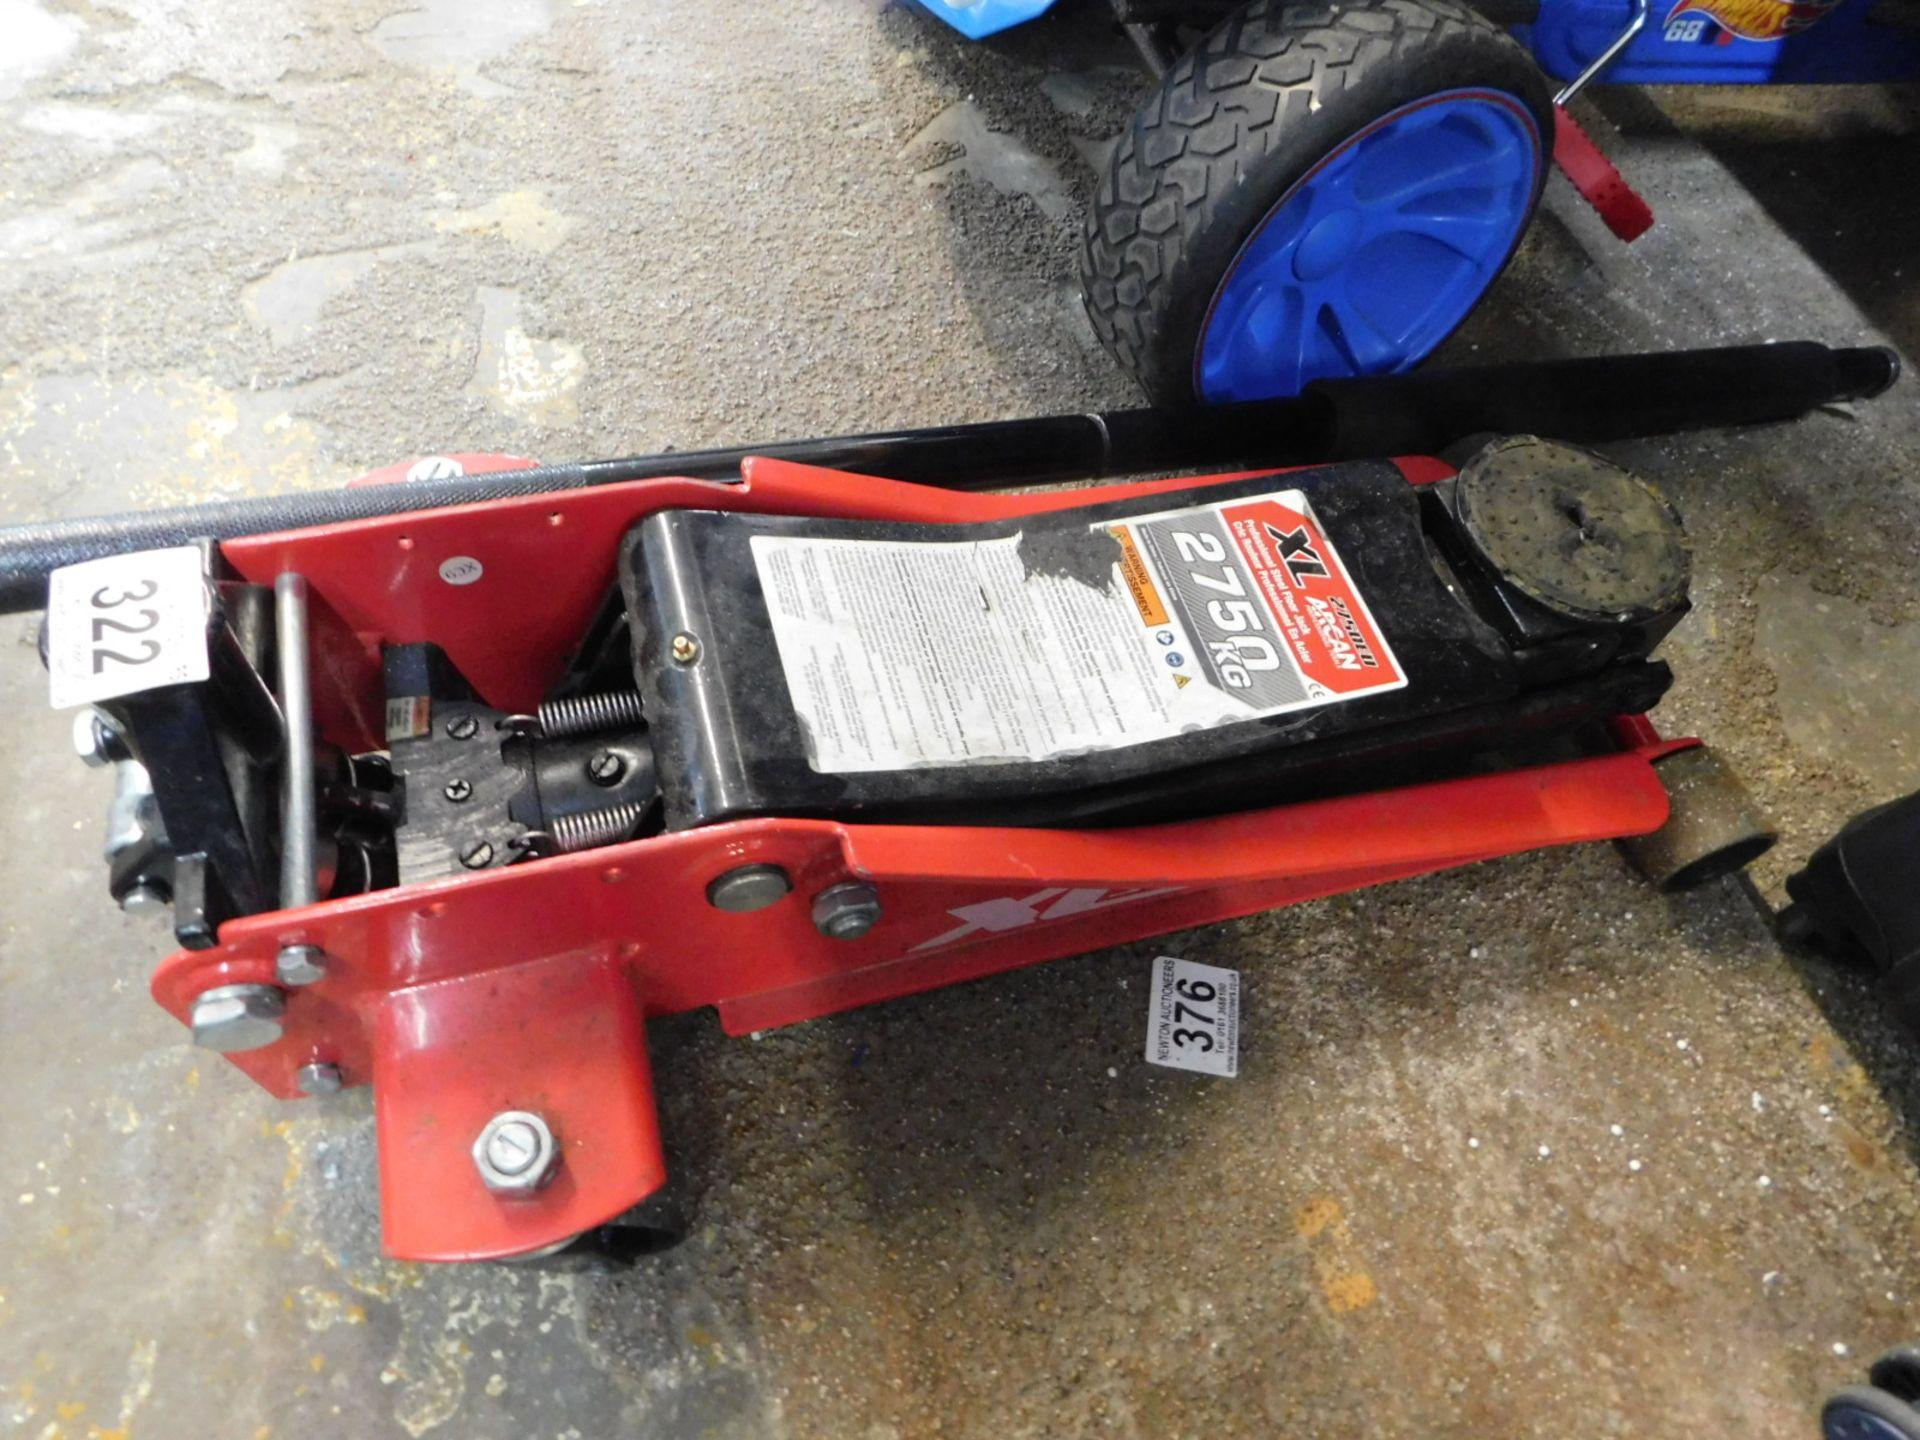 Lot 322 - 1 ARCAN XL2750EU 2750KG STEEL SERVICE JACK RRP £199